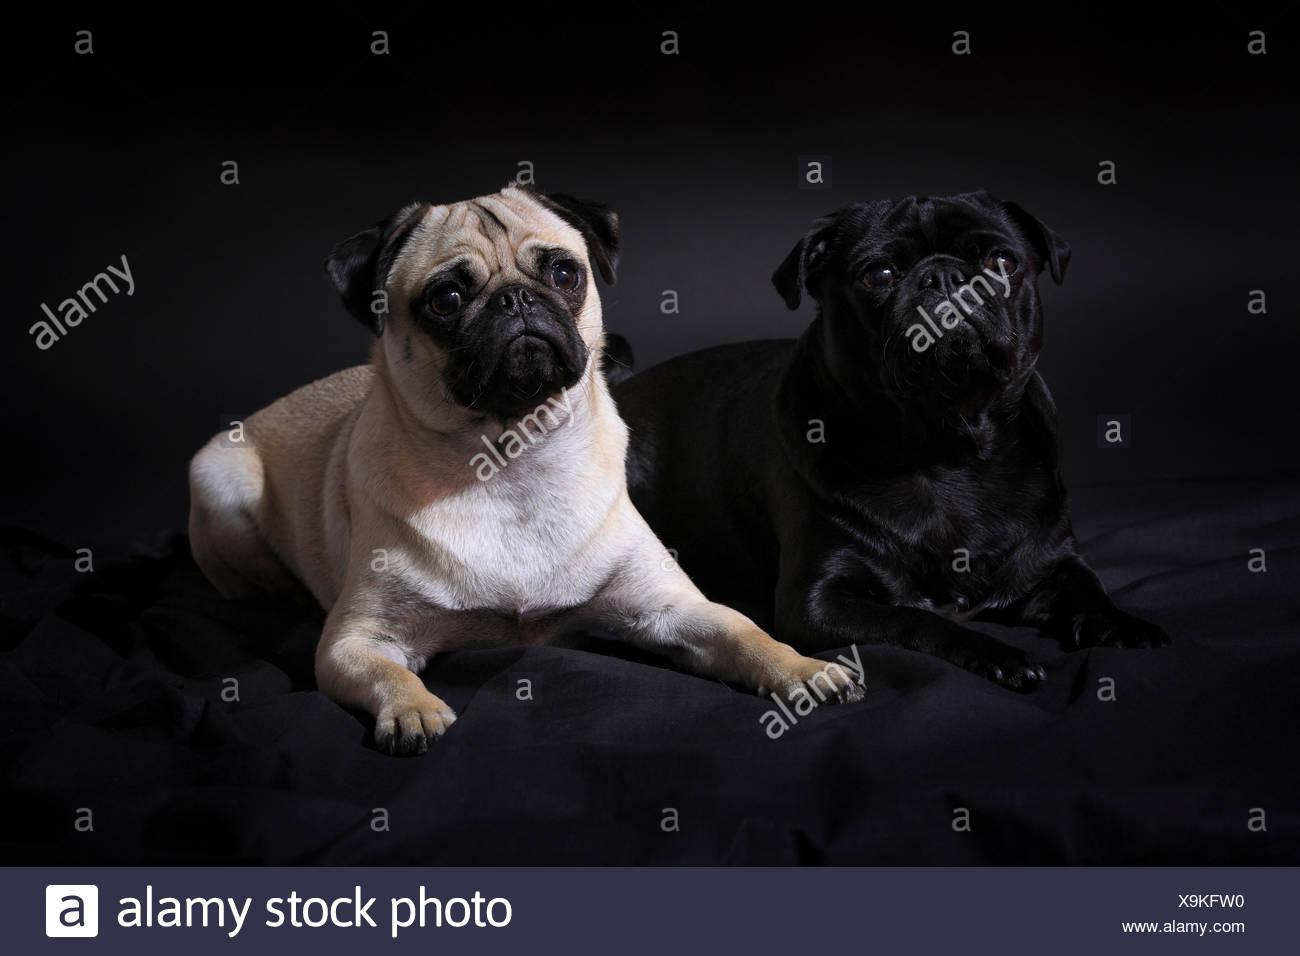 2, domestic animal, pet, dog, dogs, pugs, fatties, mops, pugs, fatties, pair, couple, portrait, couple, four-legged, animal, bei - Stock Image